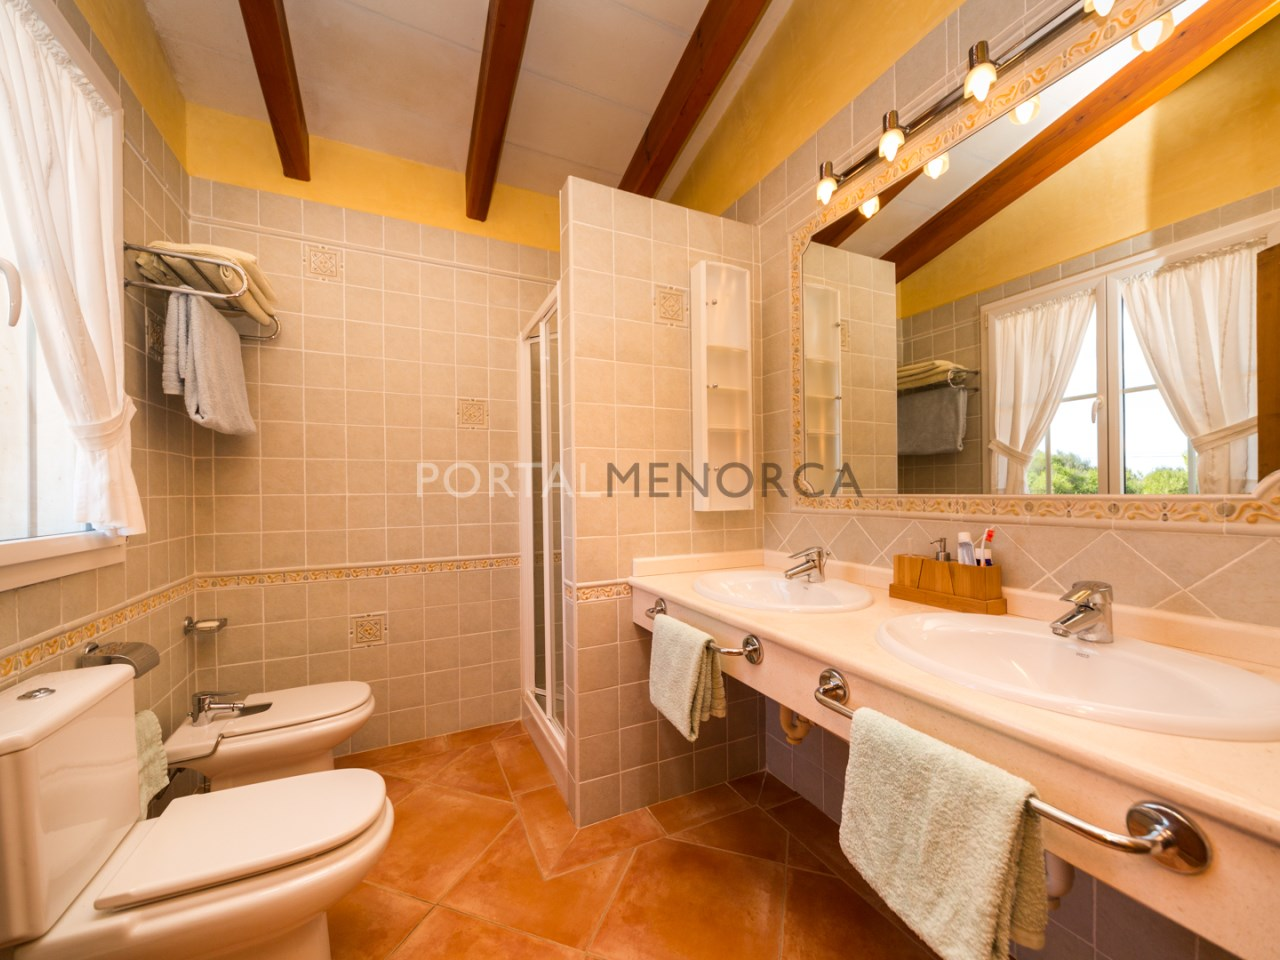 Casa de campo con piscina en Menorca (39 de 41)